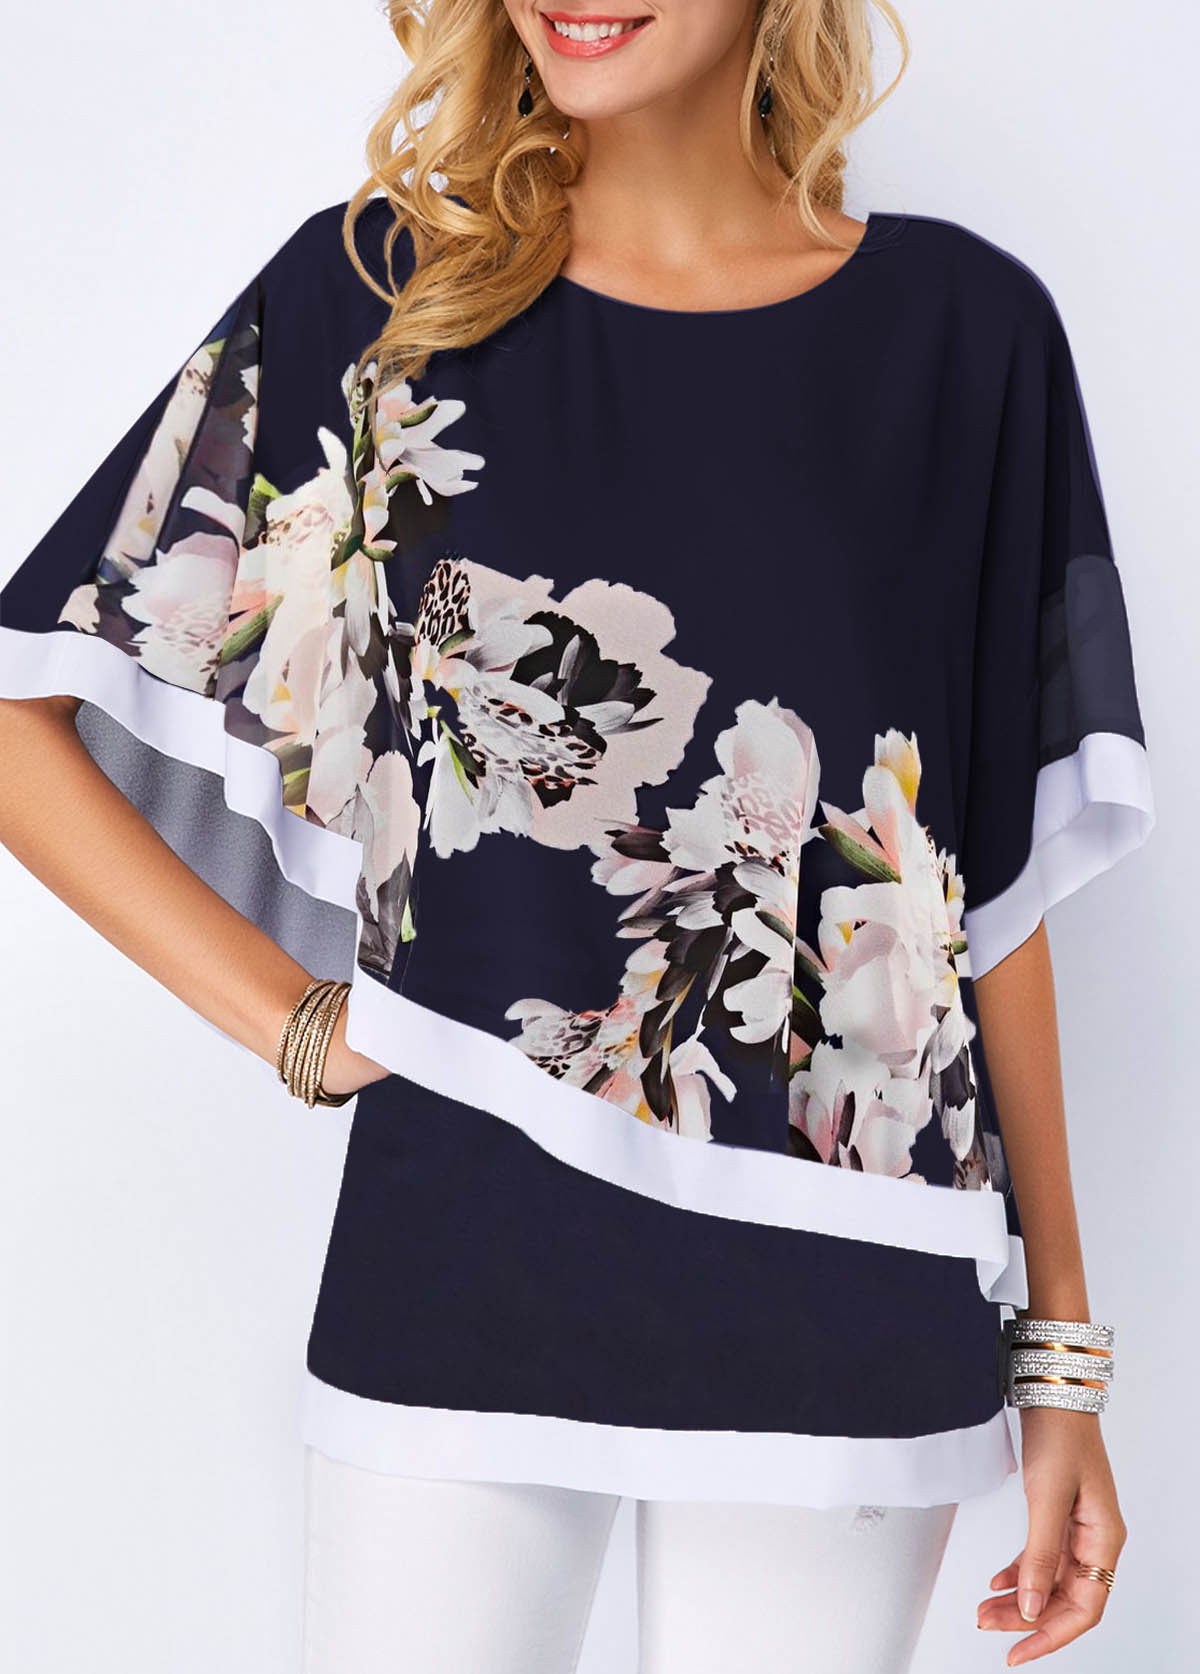 Round Neck Overlay Embellished Flower Print Blouse